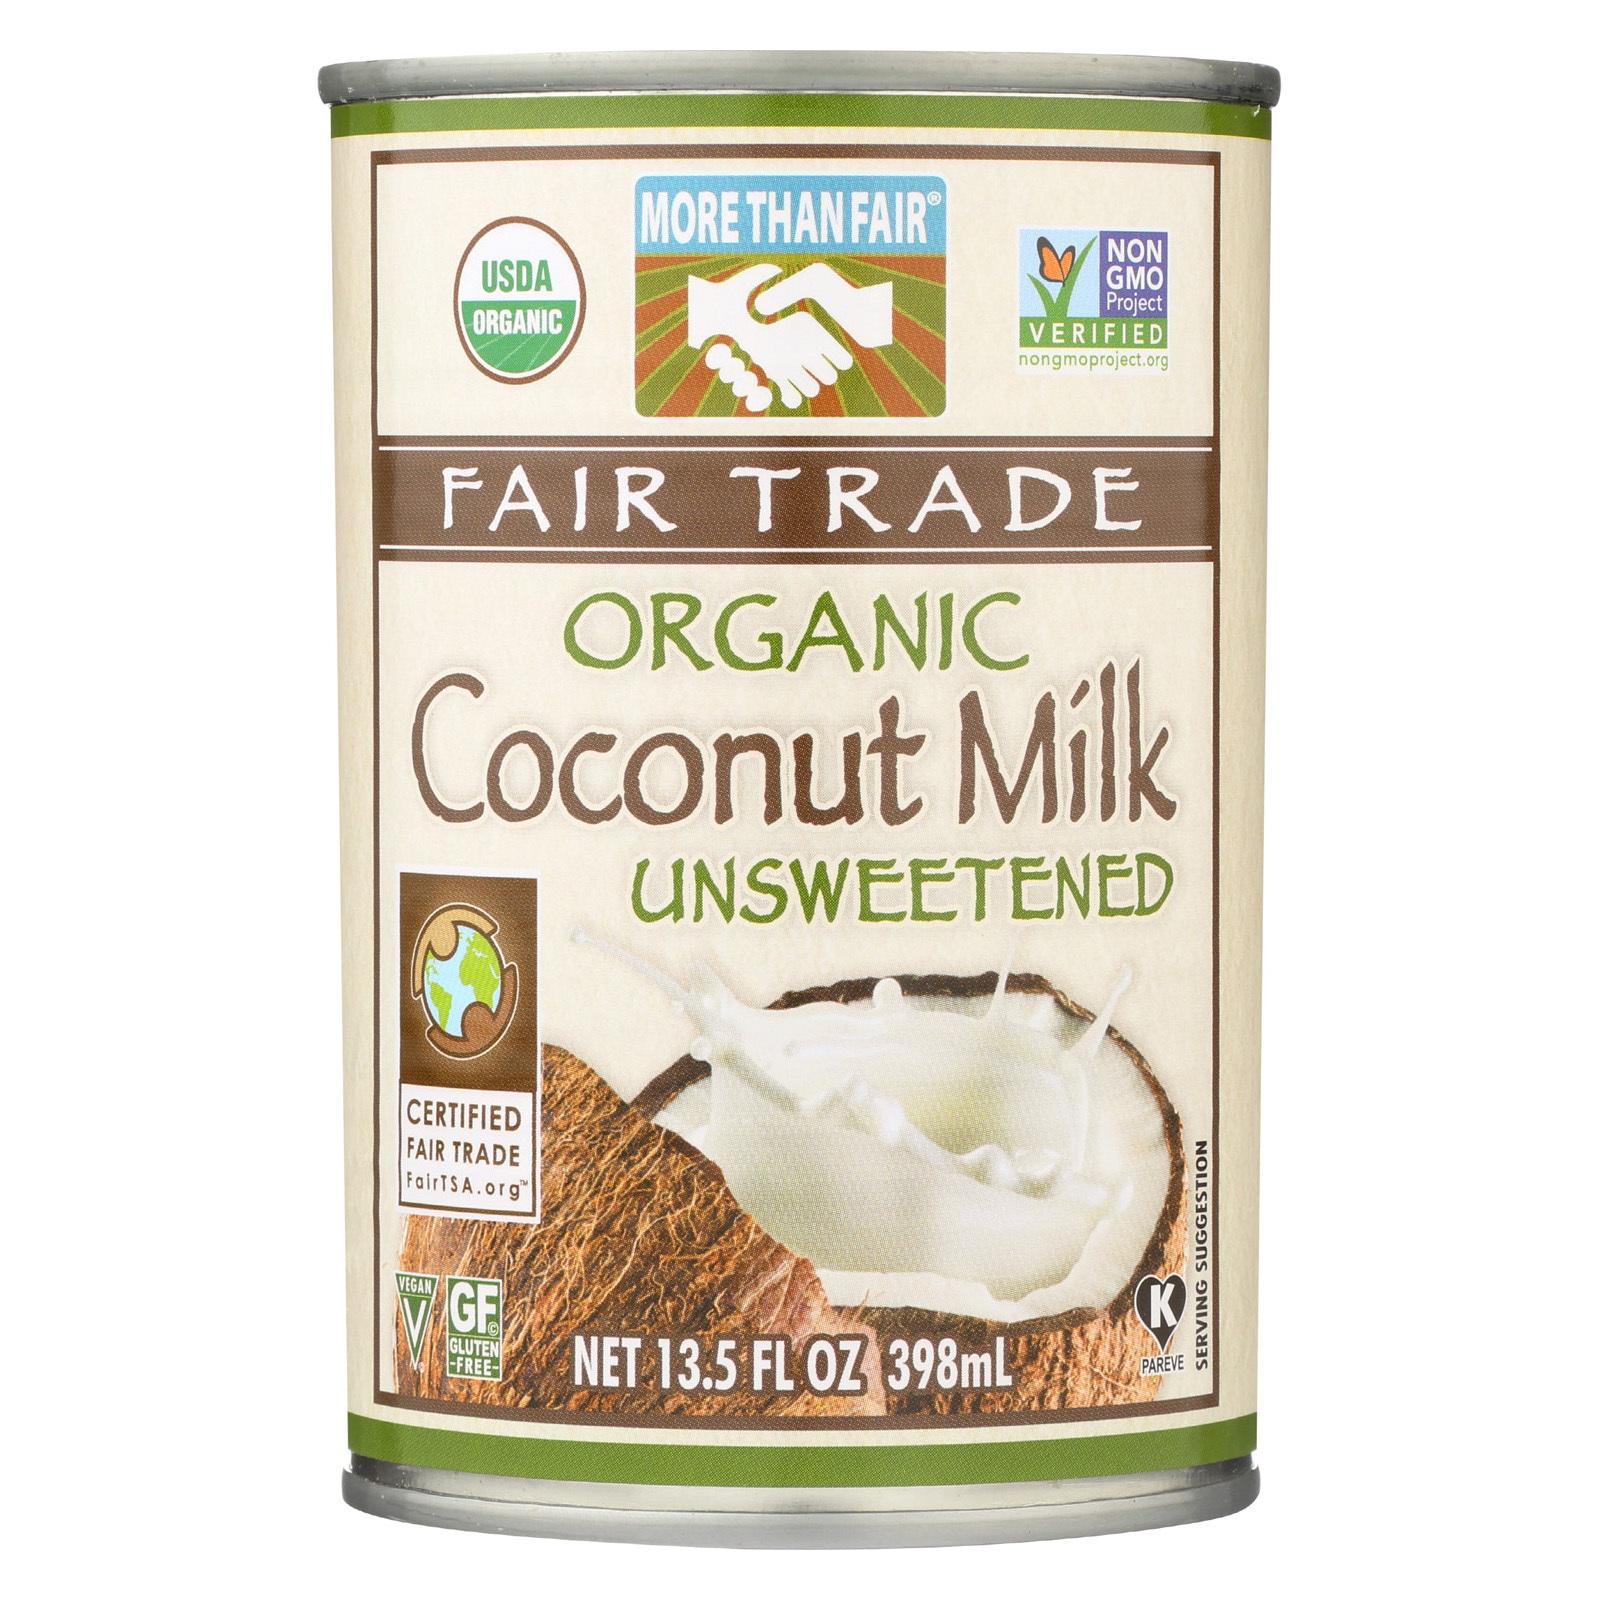 More Than Fair Organic Coconut Milk - Classic Unsweetened - Case of 12 - 13.5 Fl oz.